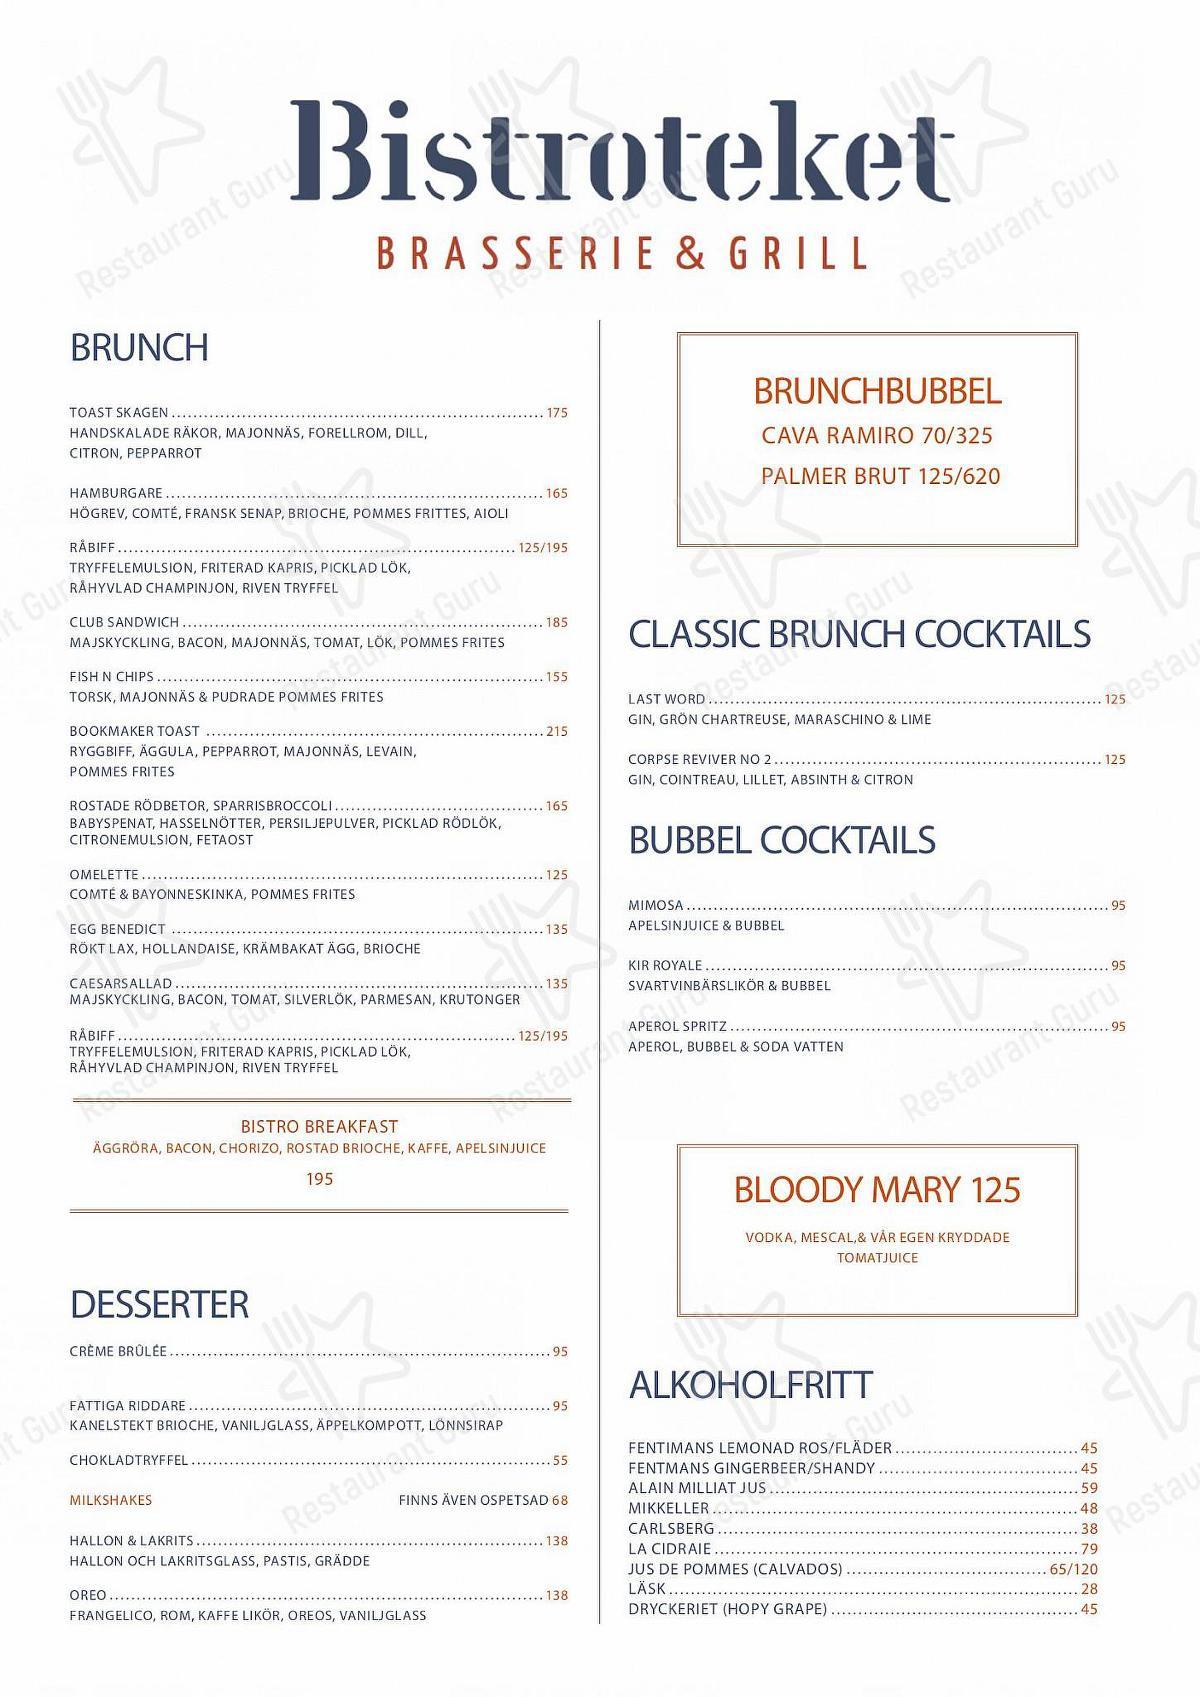 Bistroteket menu - meals and drinks